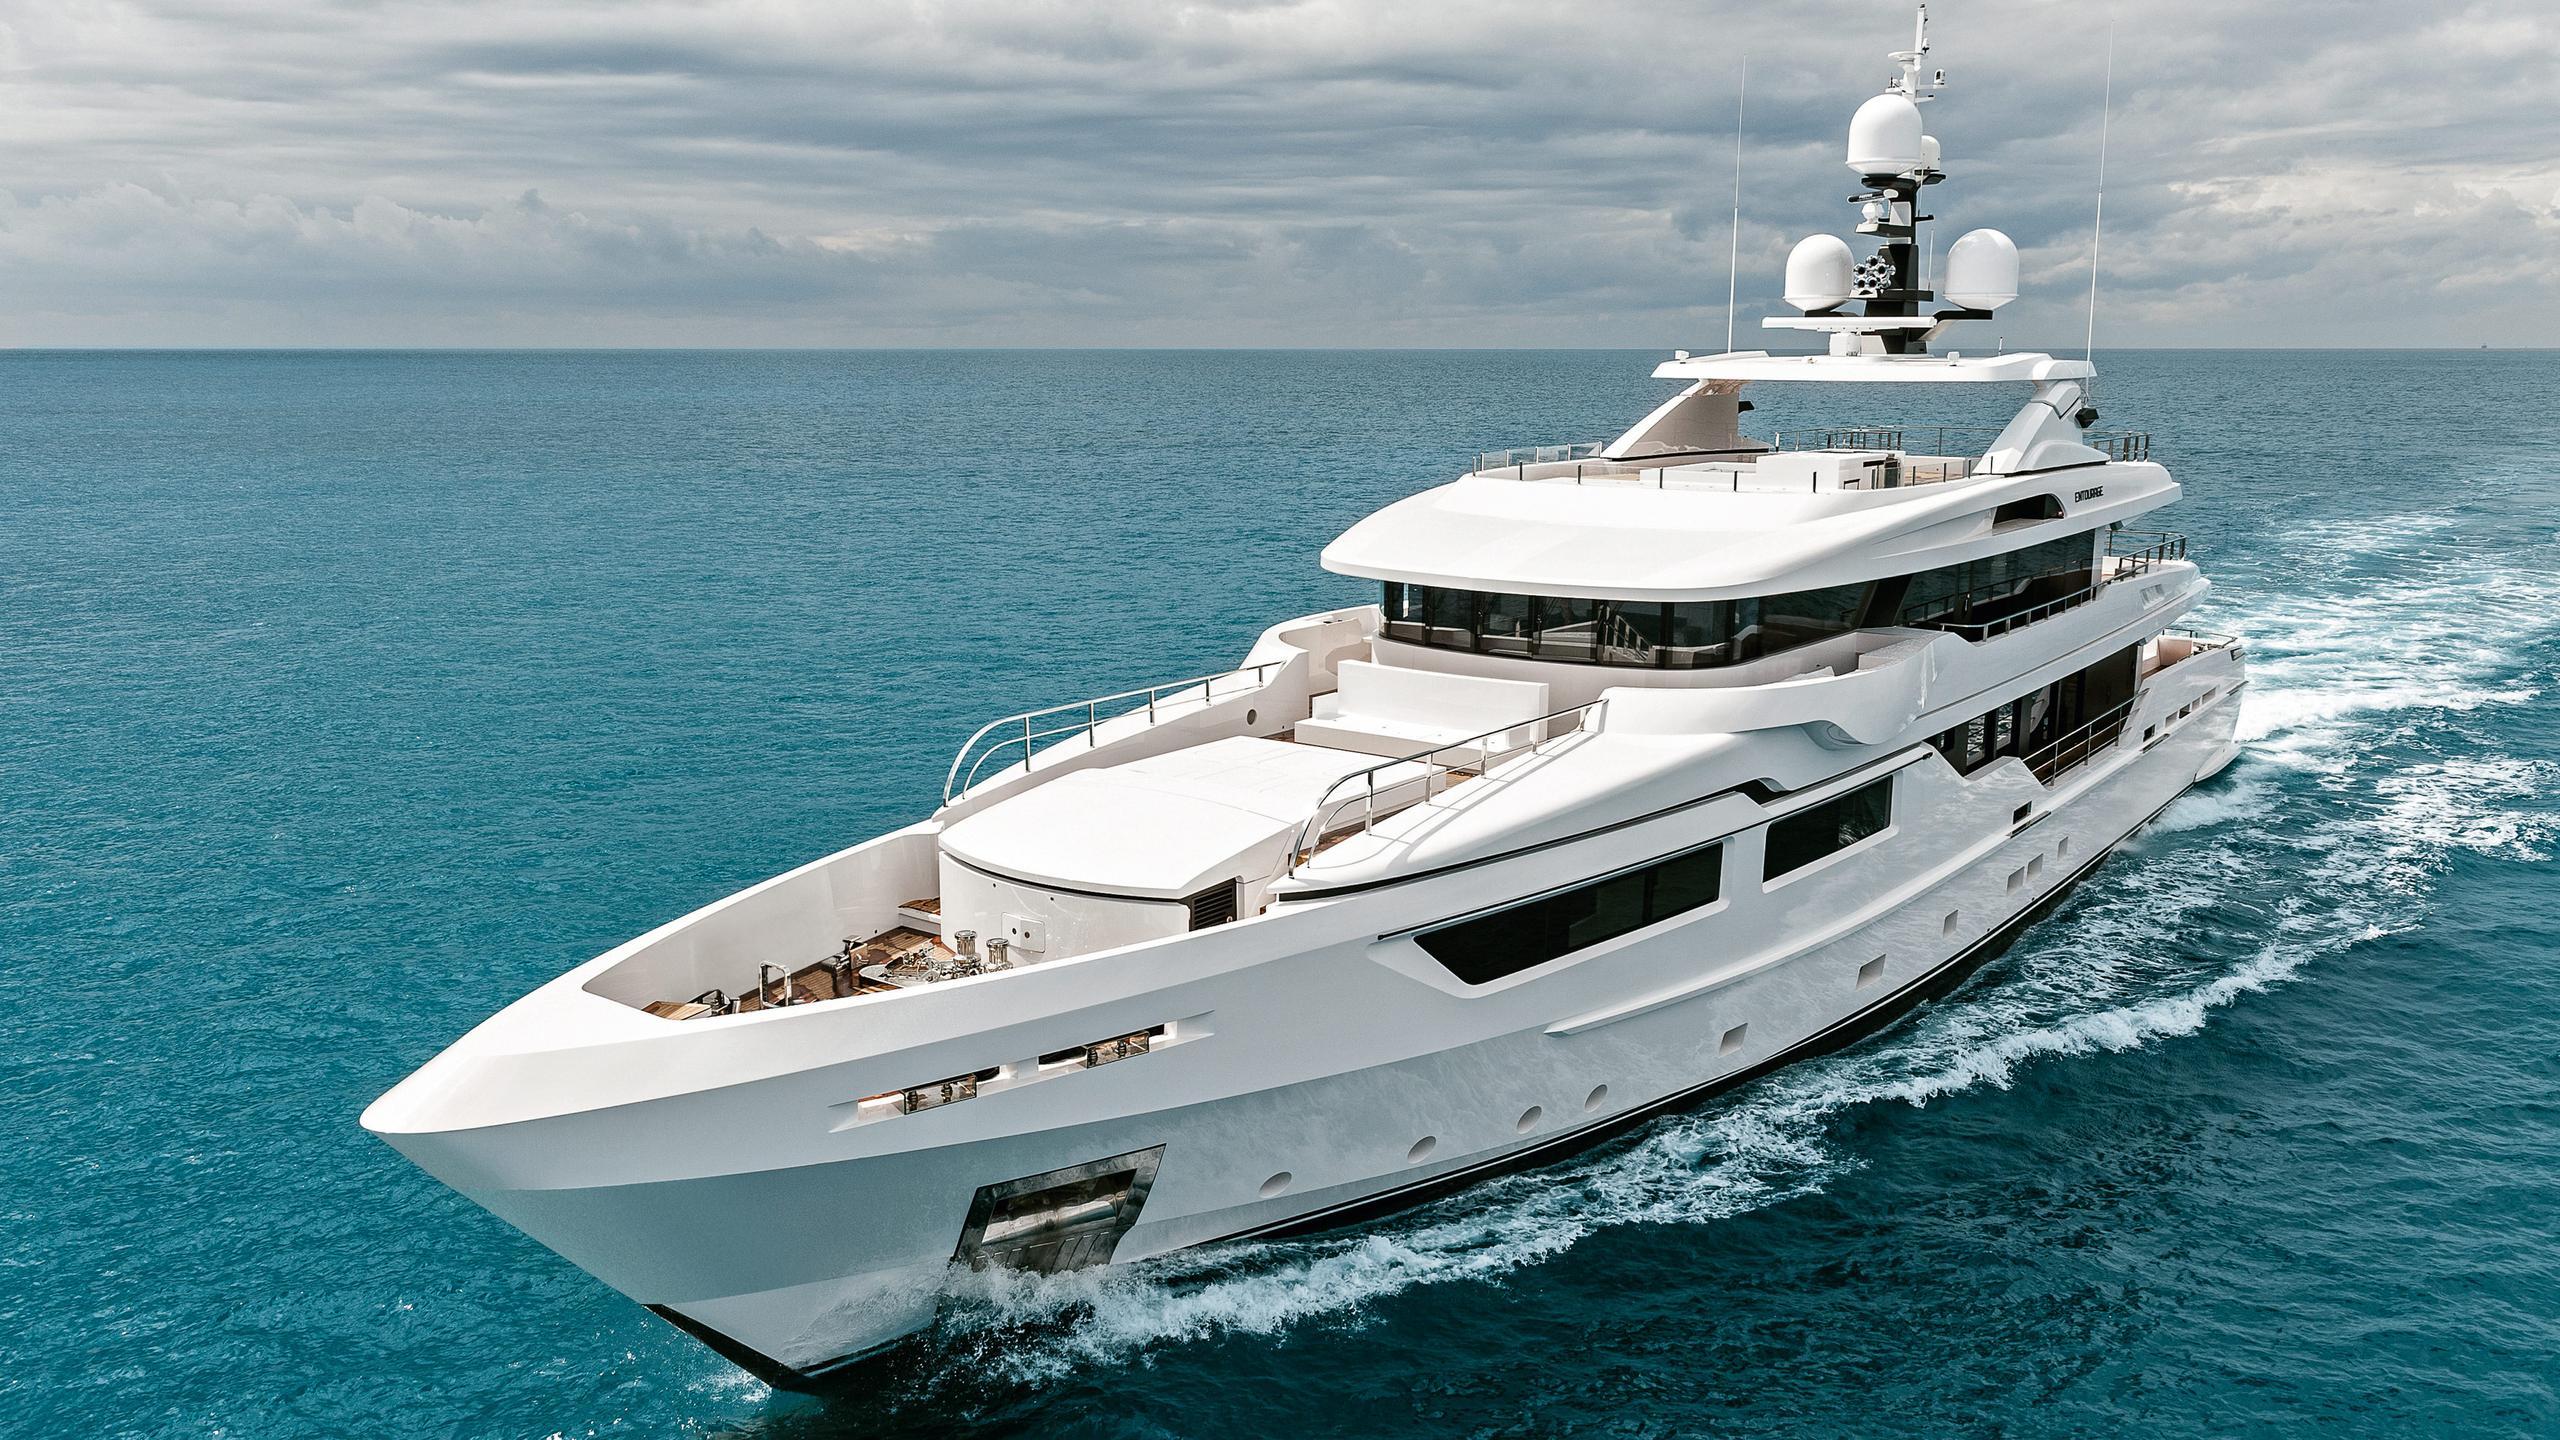 entourage-motor-yacht-admiral-the-italian-sea-group-2014-47m-half-profile-cruising